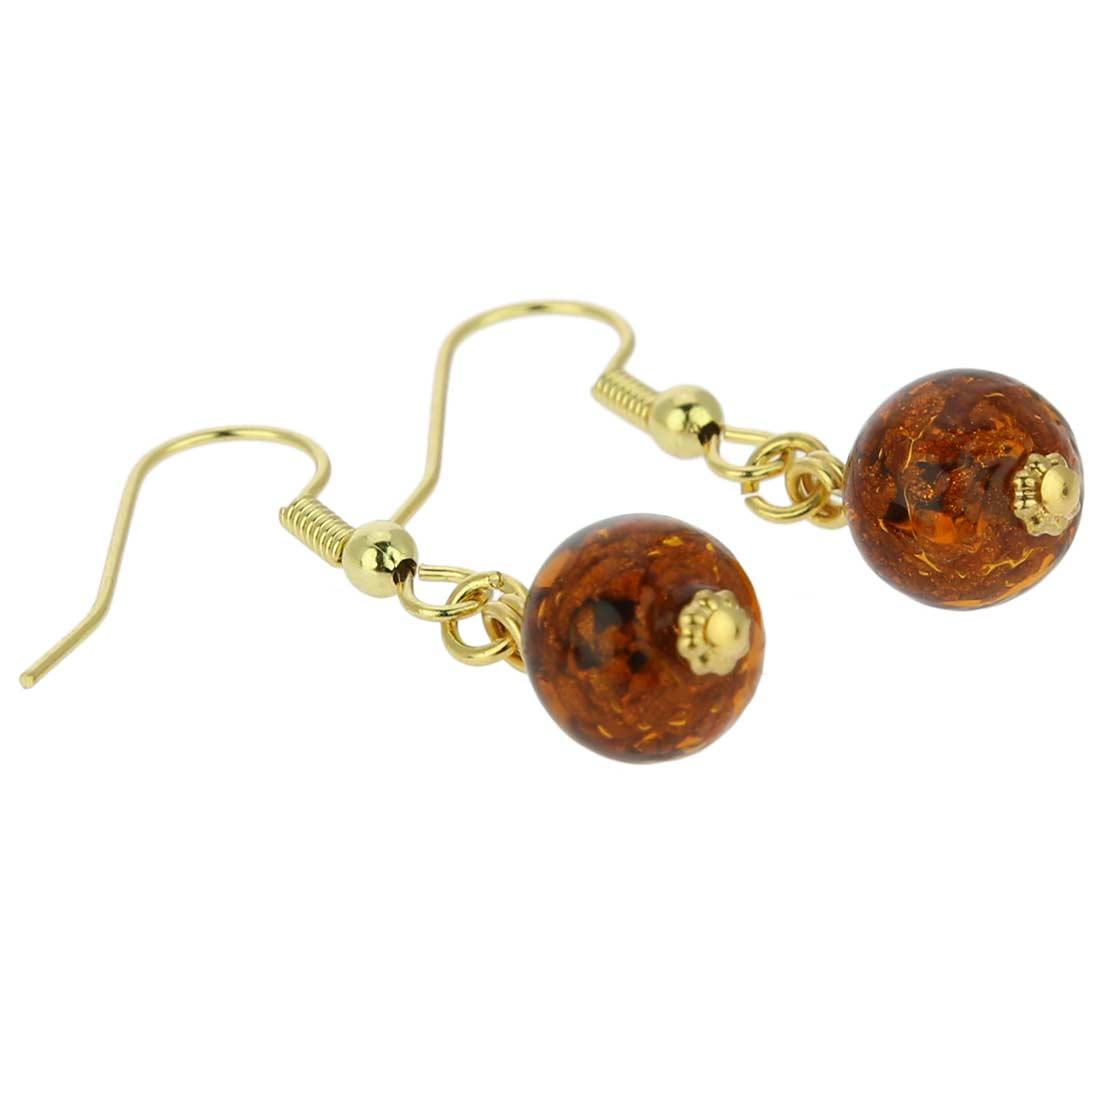 Starlight balls earrings - cognac